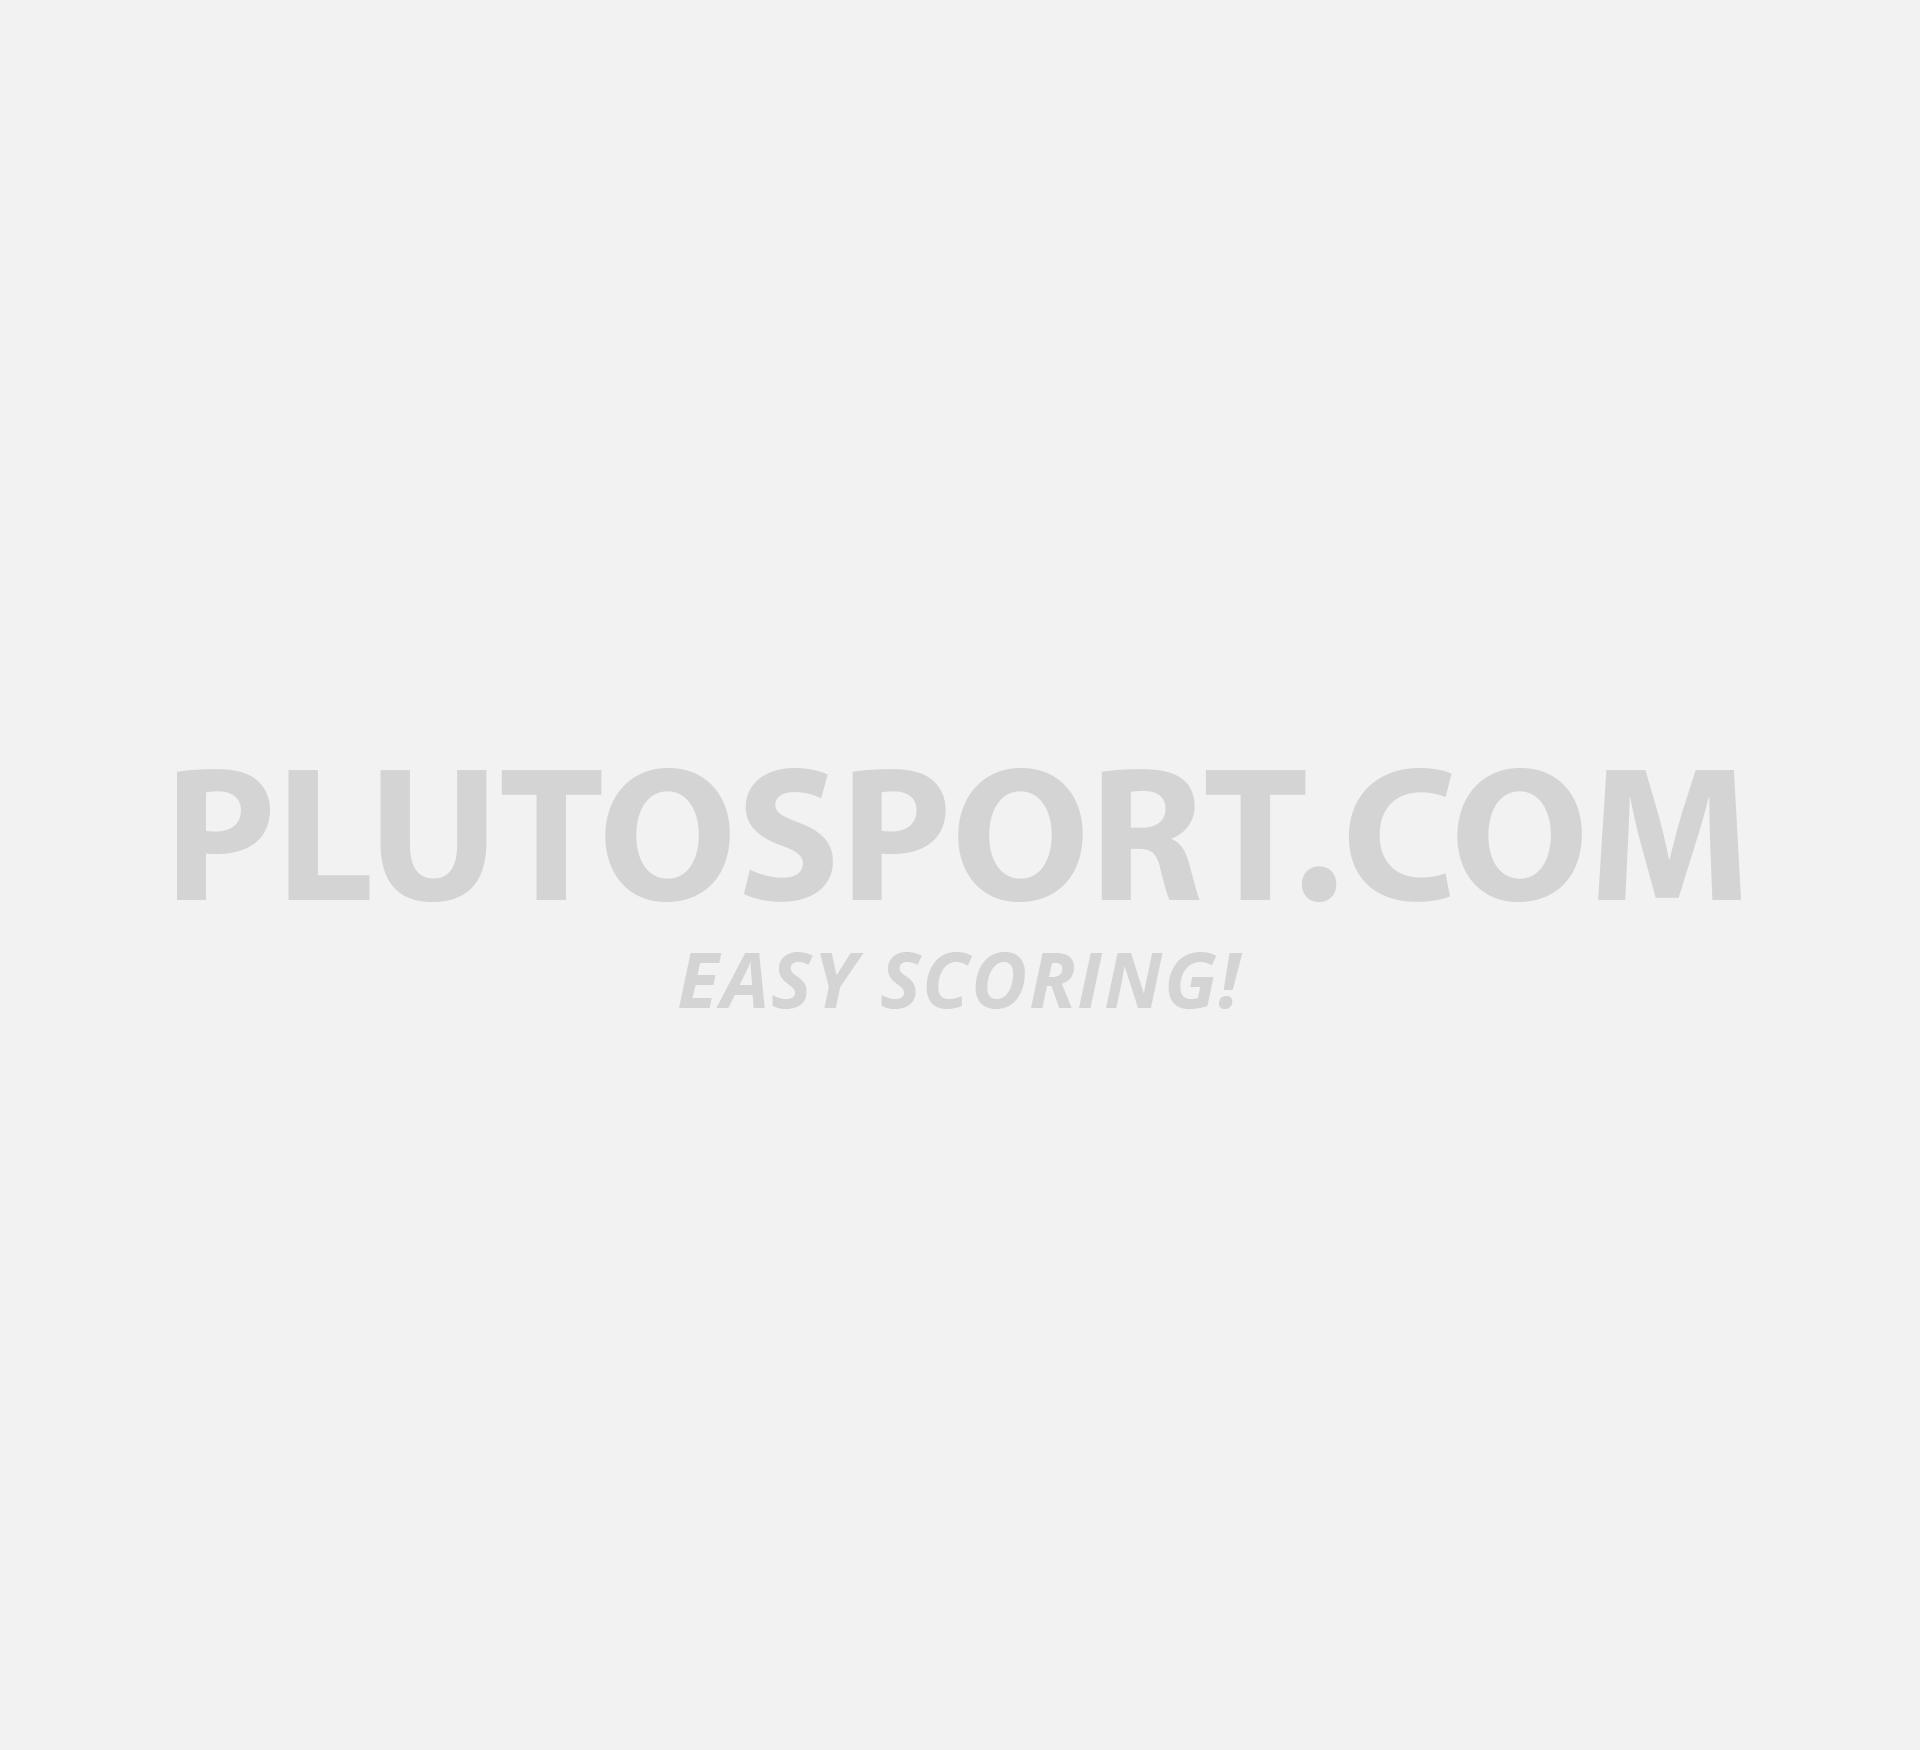 b766ca3fc7c9 Tenson Zippy Top - Thermal Shirts Longsleeves - Thermal Wear - Clothing -  Outdoor - Women | Plutosport